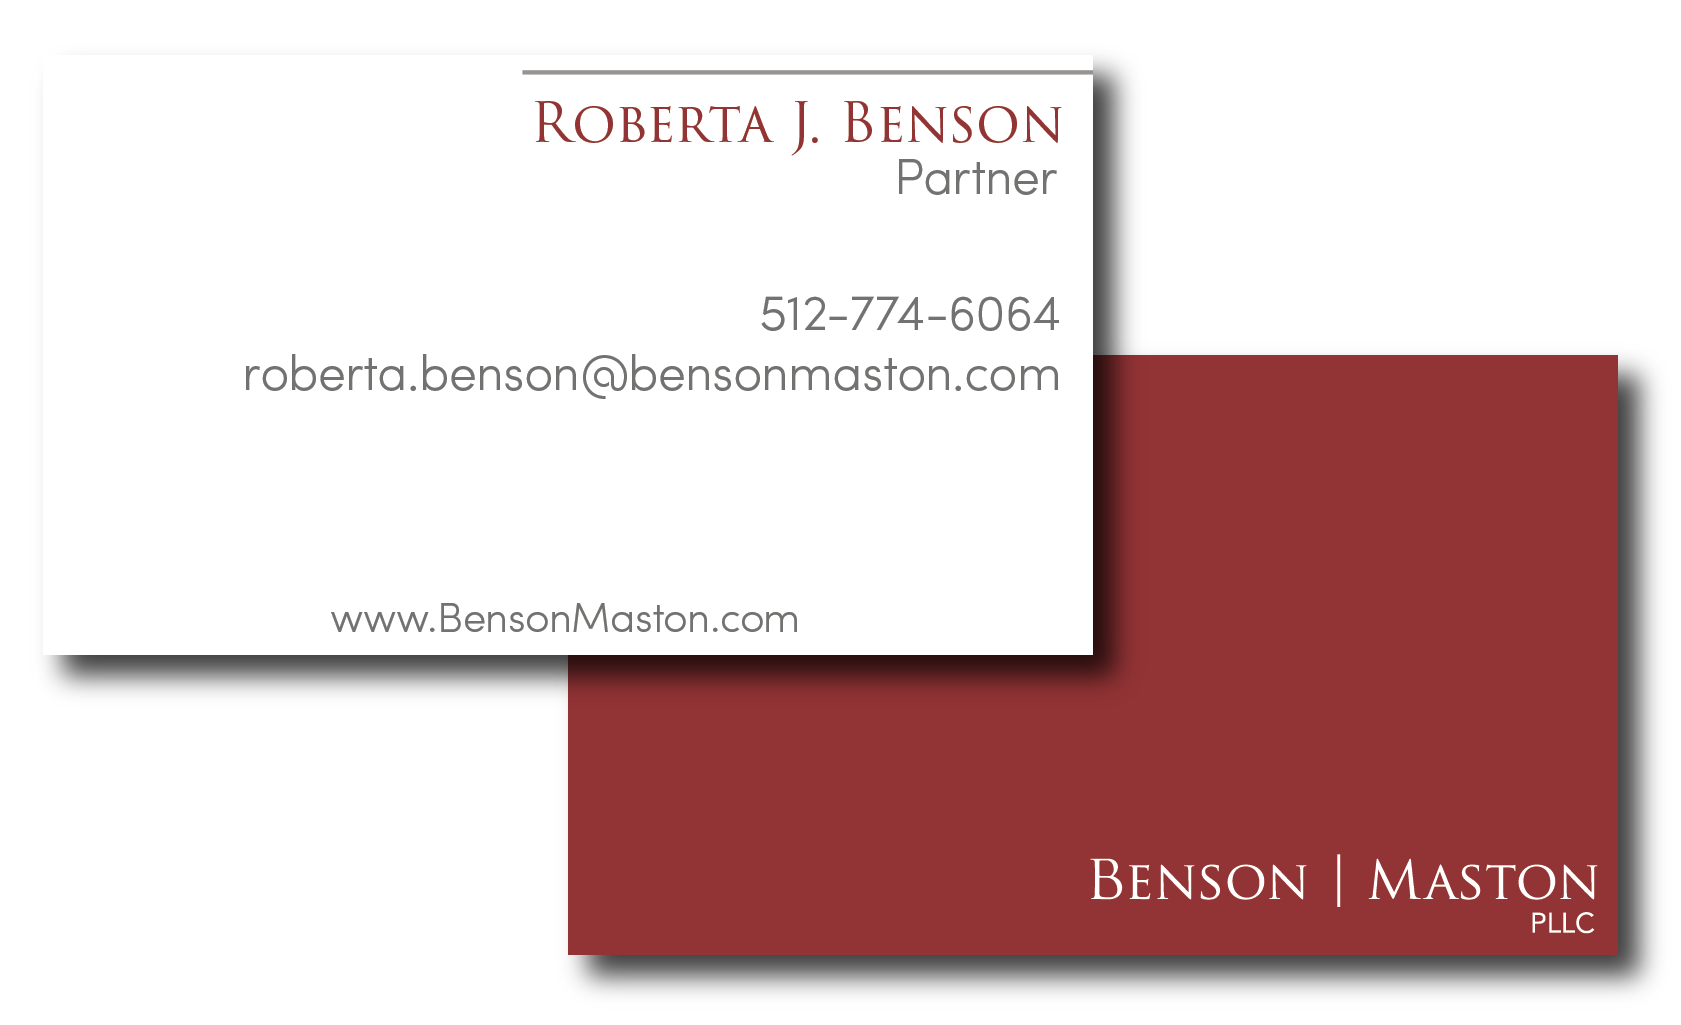 Benson Maston PLLC